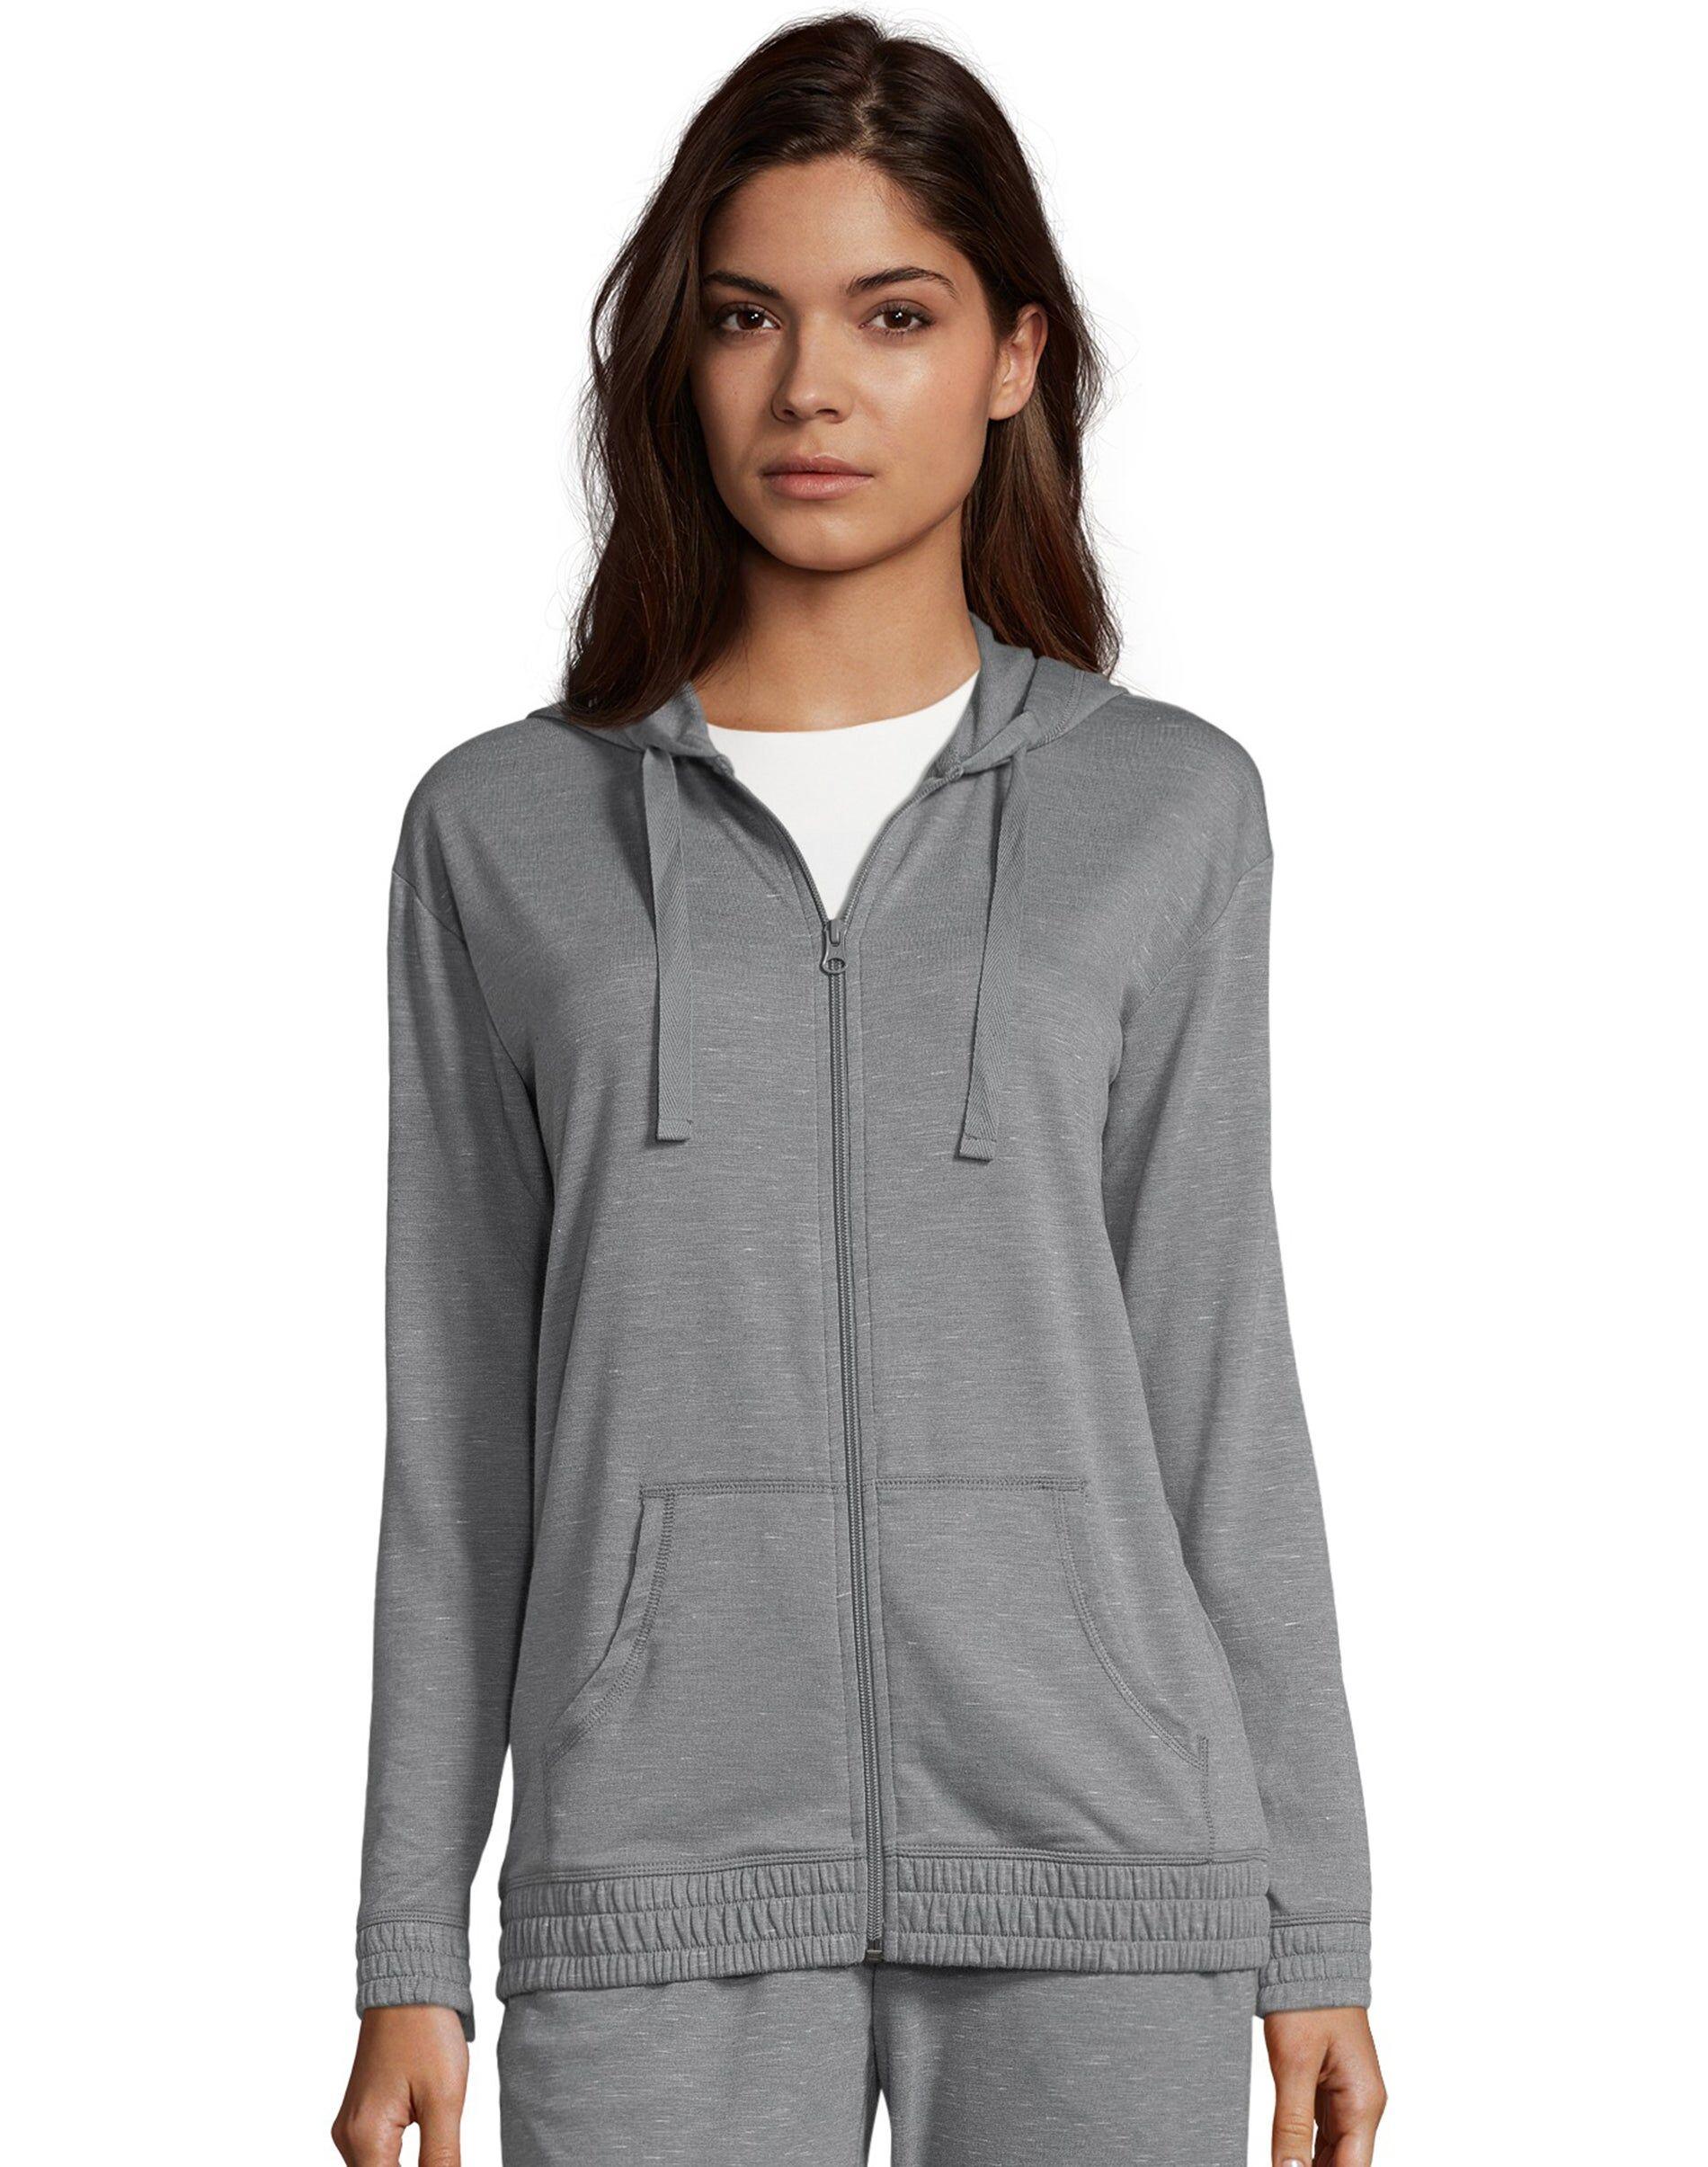 Hanes Women's French Terry Full Zip Hoodie Dada Grey Heather XL